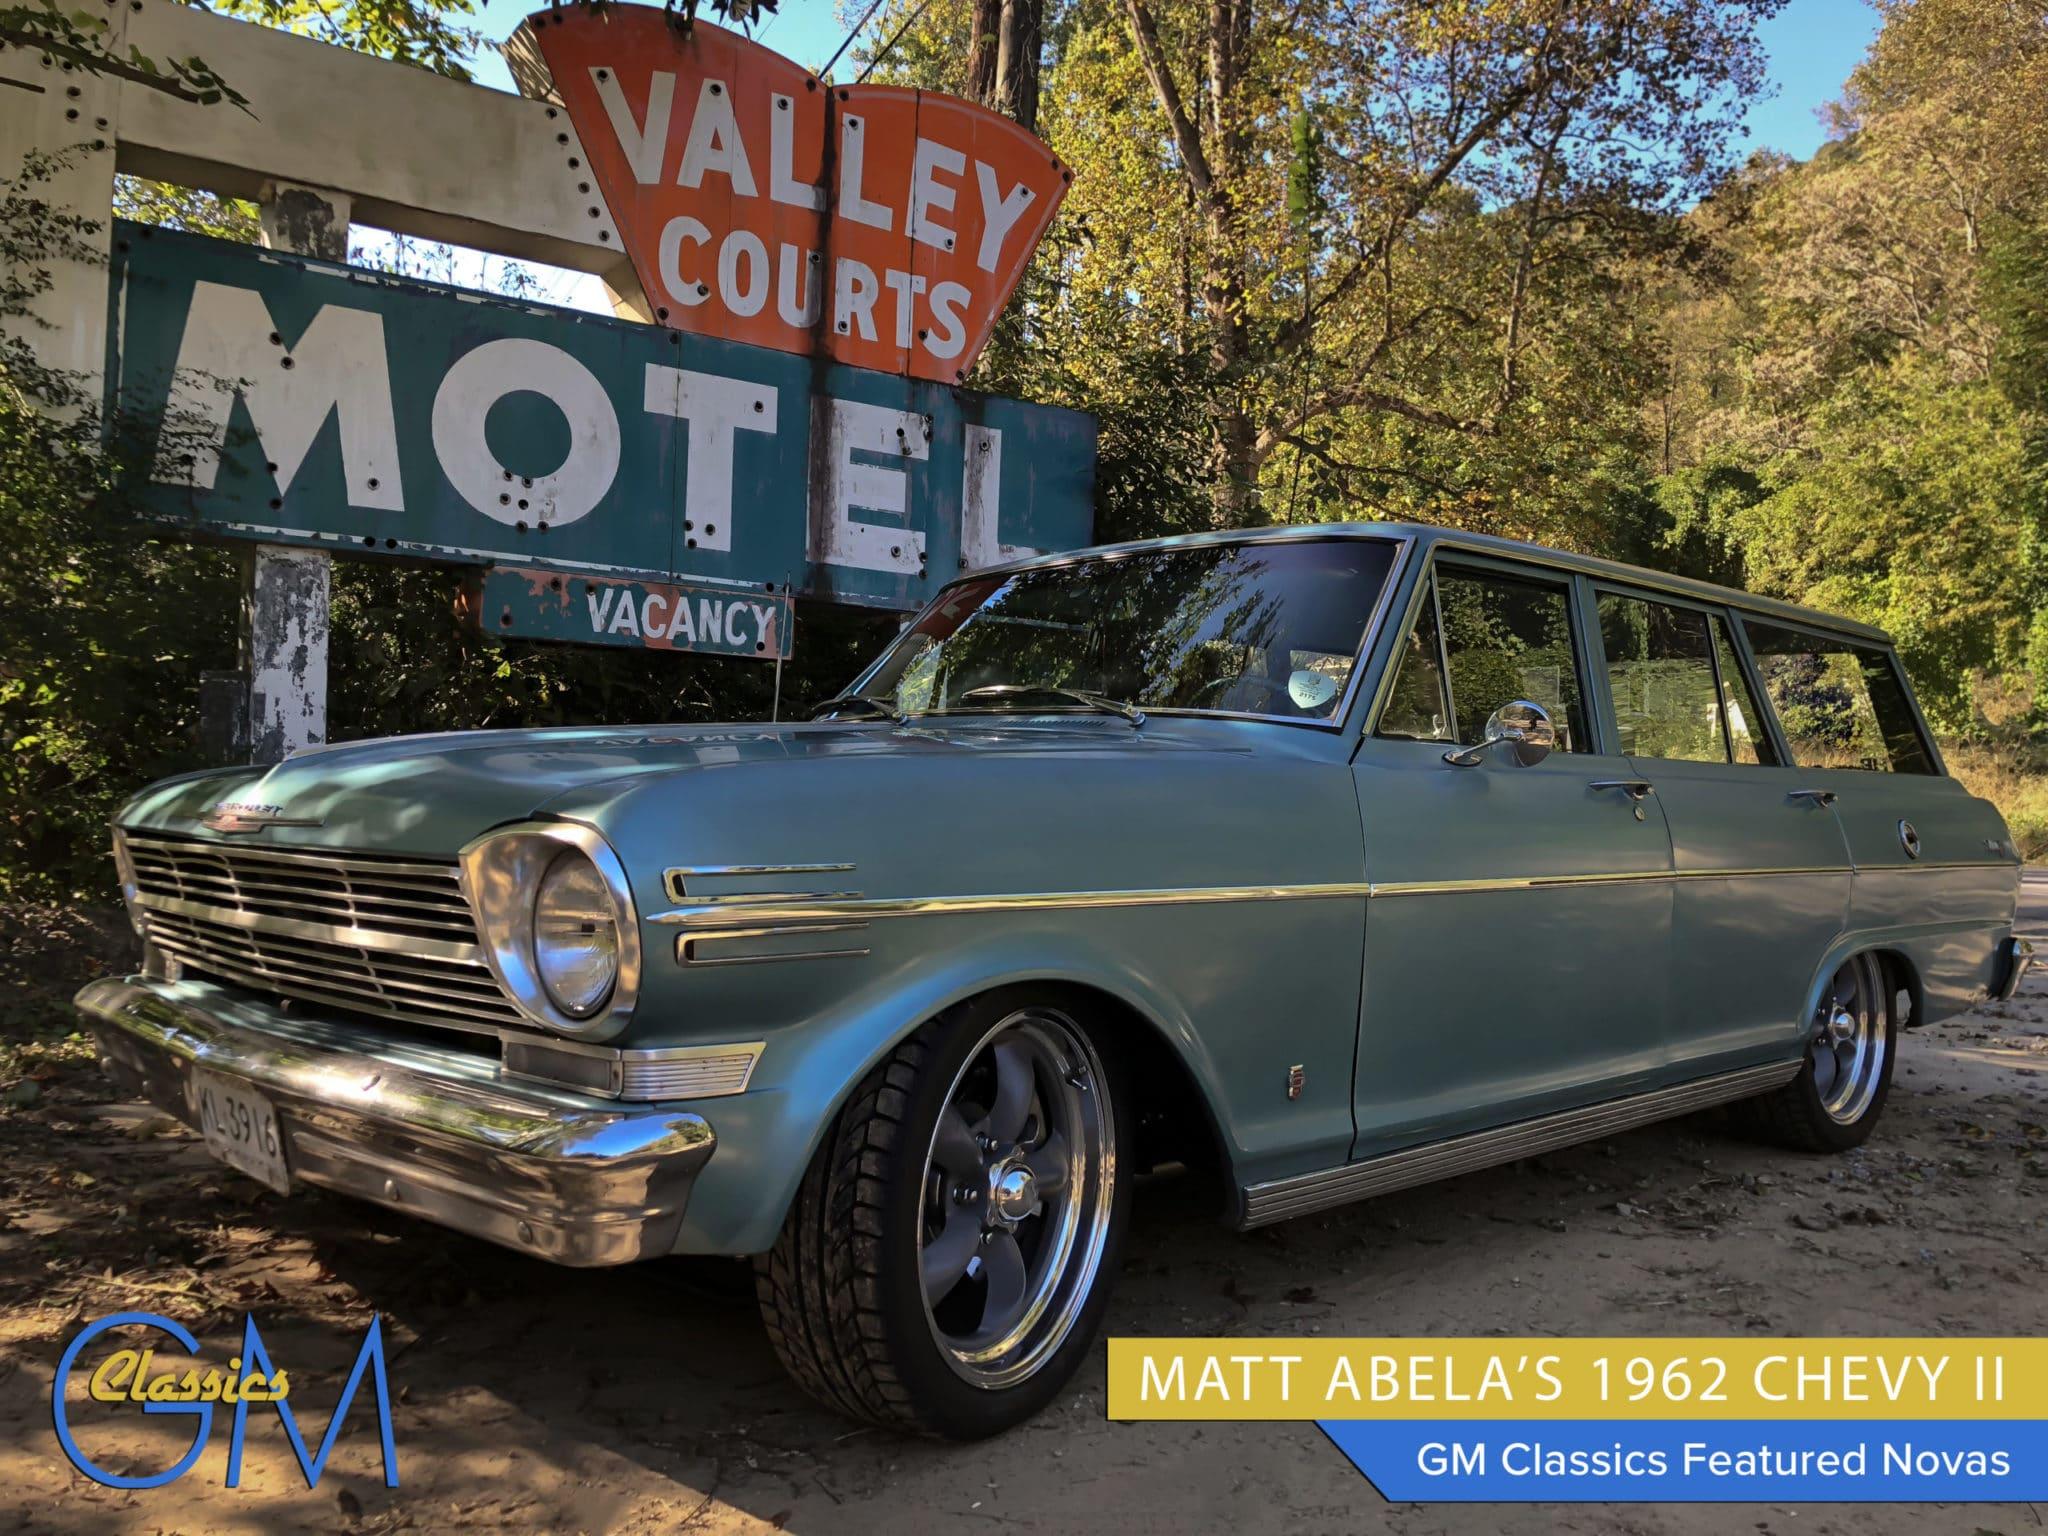 Matt Abela's 1962 Chevy II